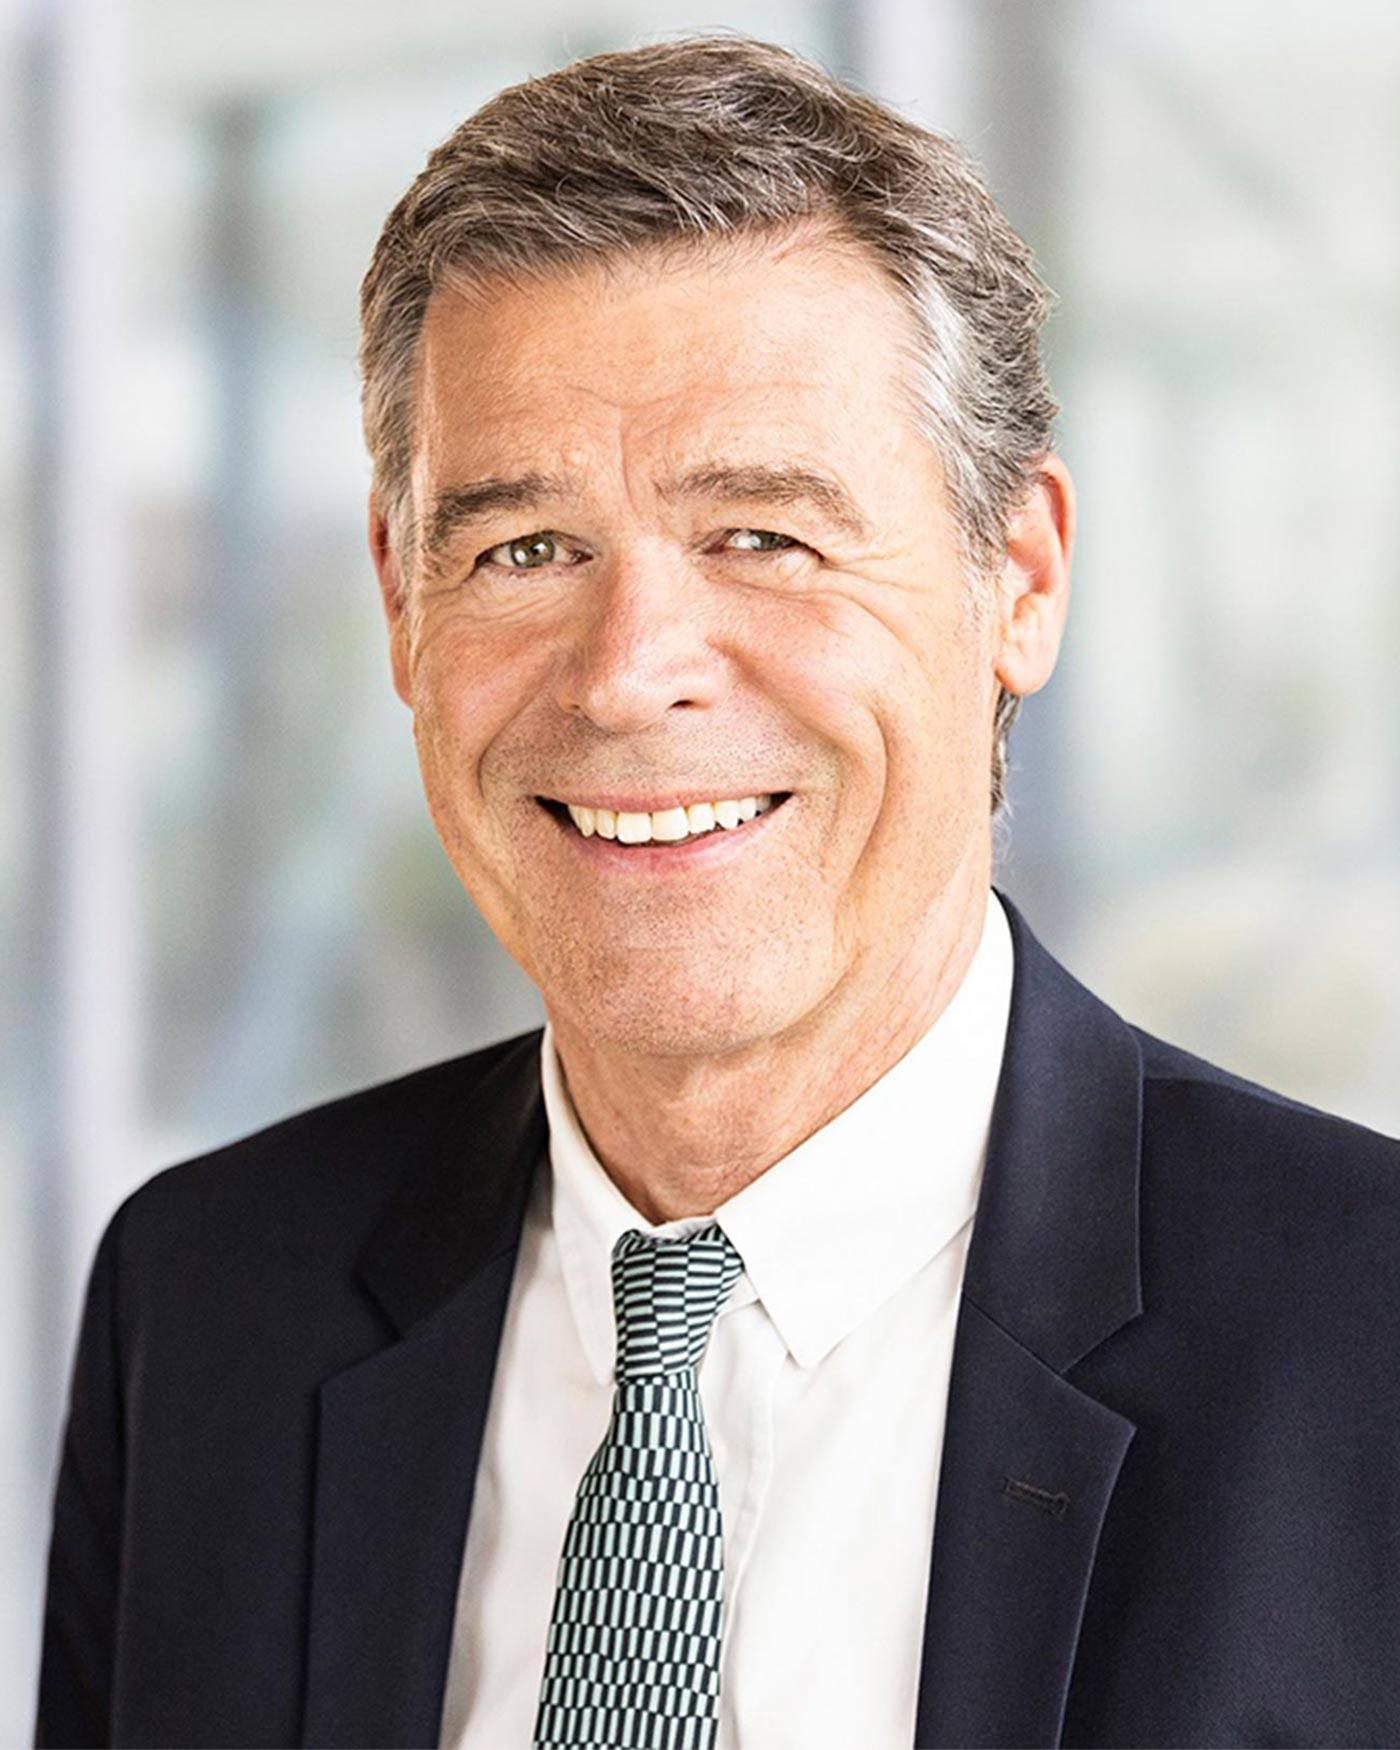 Prof. Dr. Ernst-Moritz Lipp